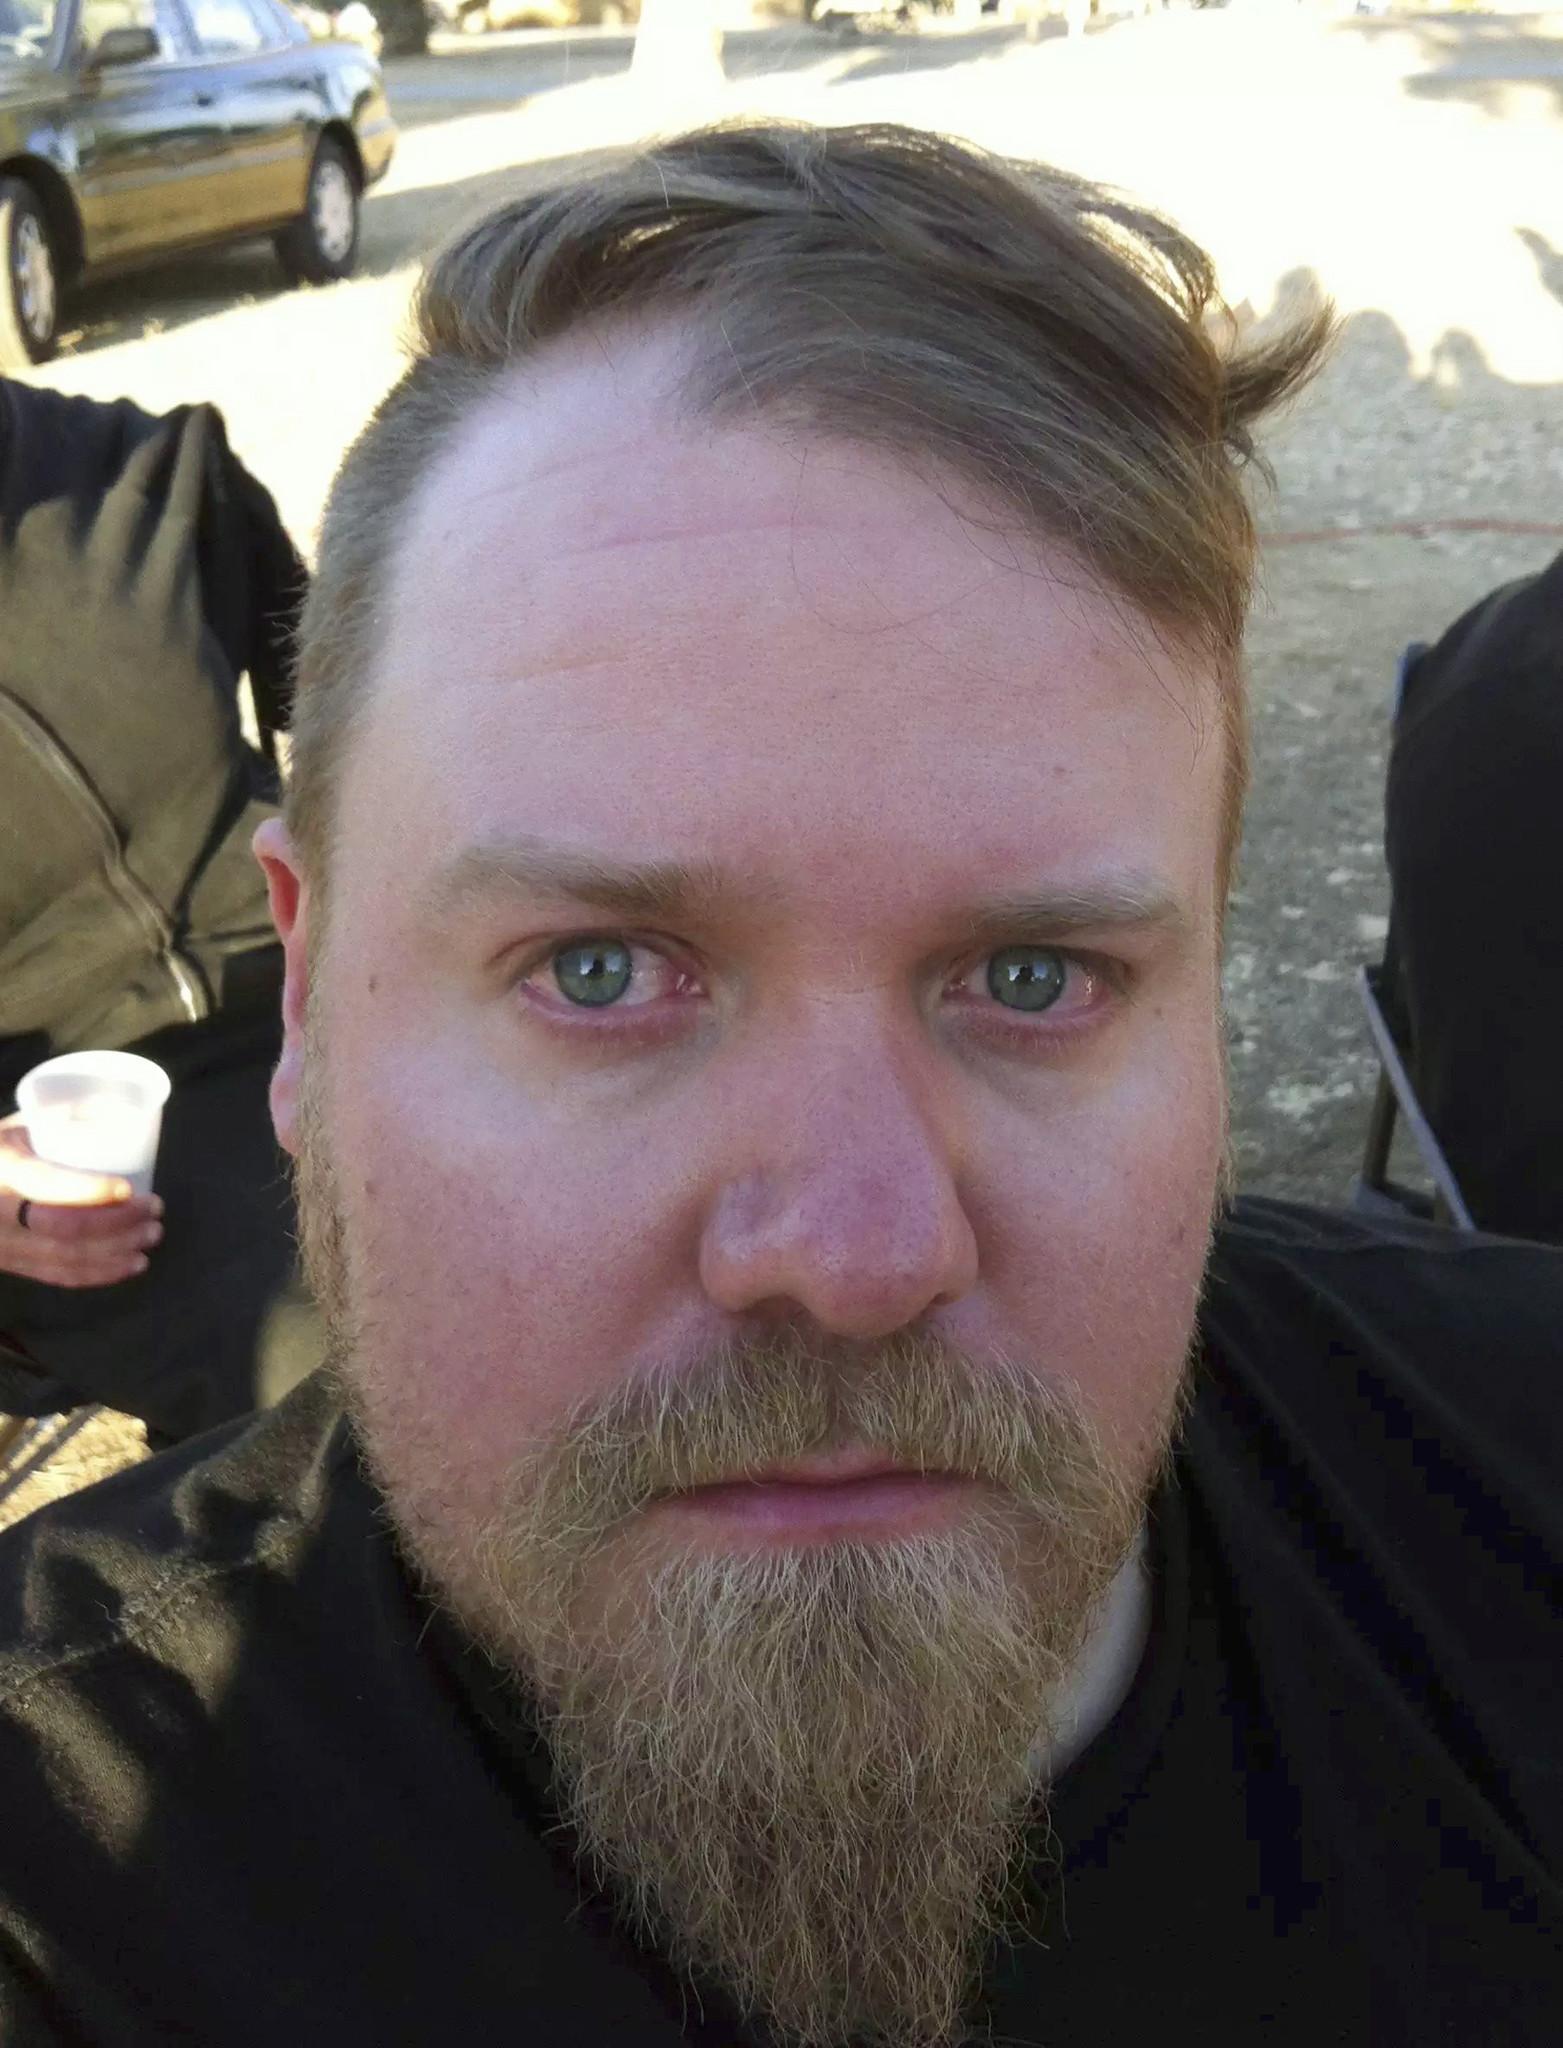 Barrett Clark, 35